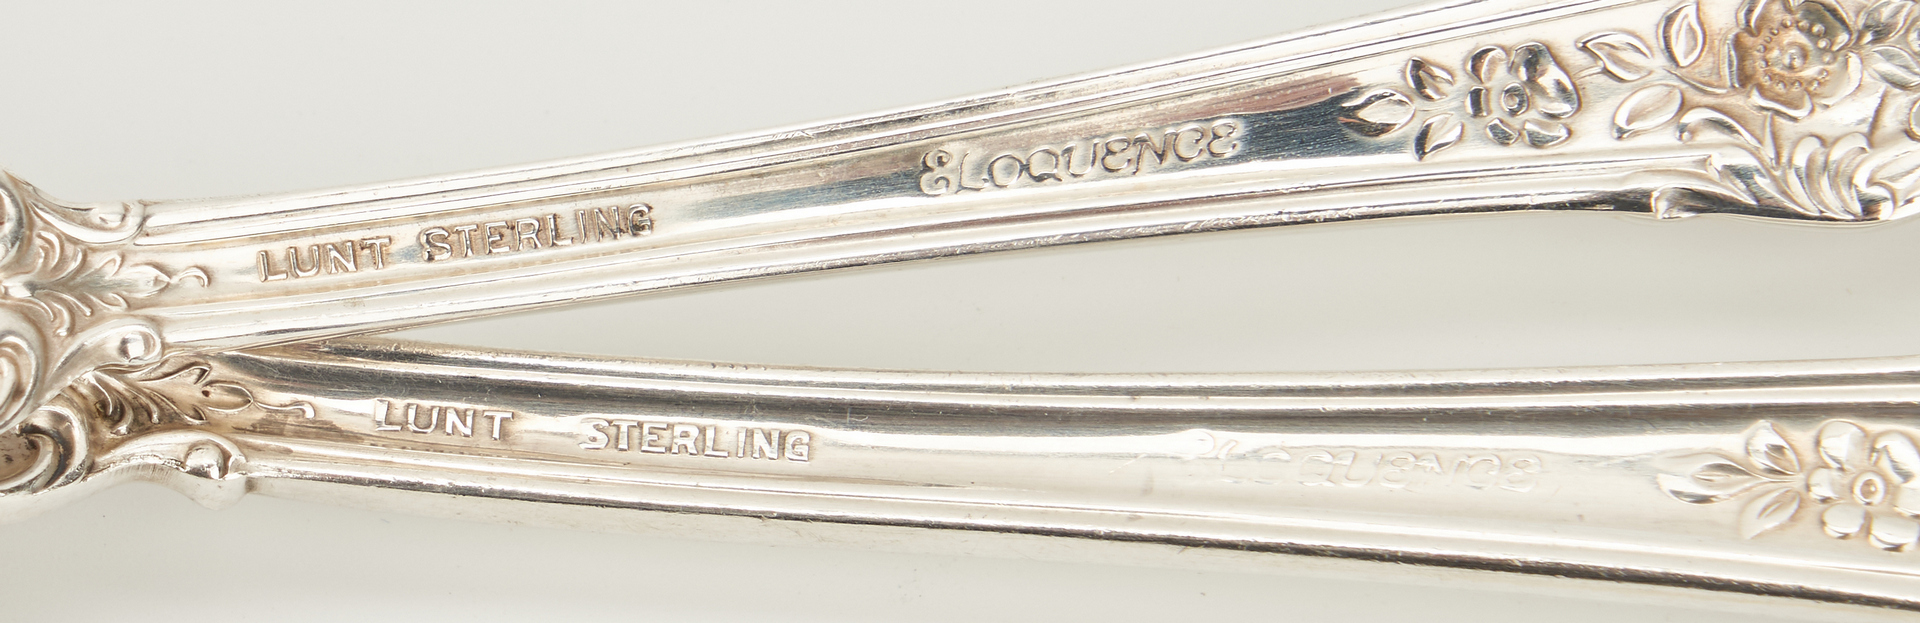 Lot 236: 60 Pcs. Lunt Eloquence Pattern Sterling Flatware